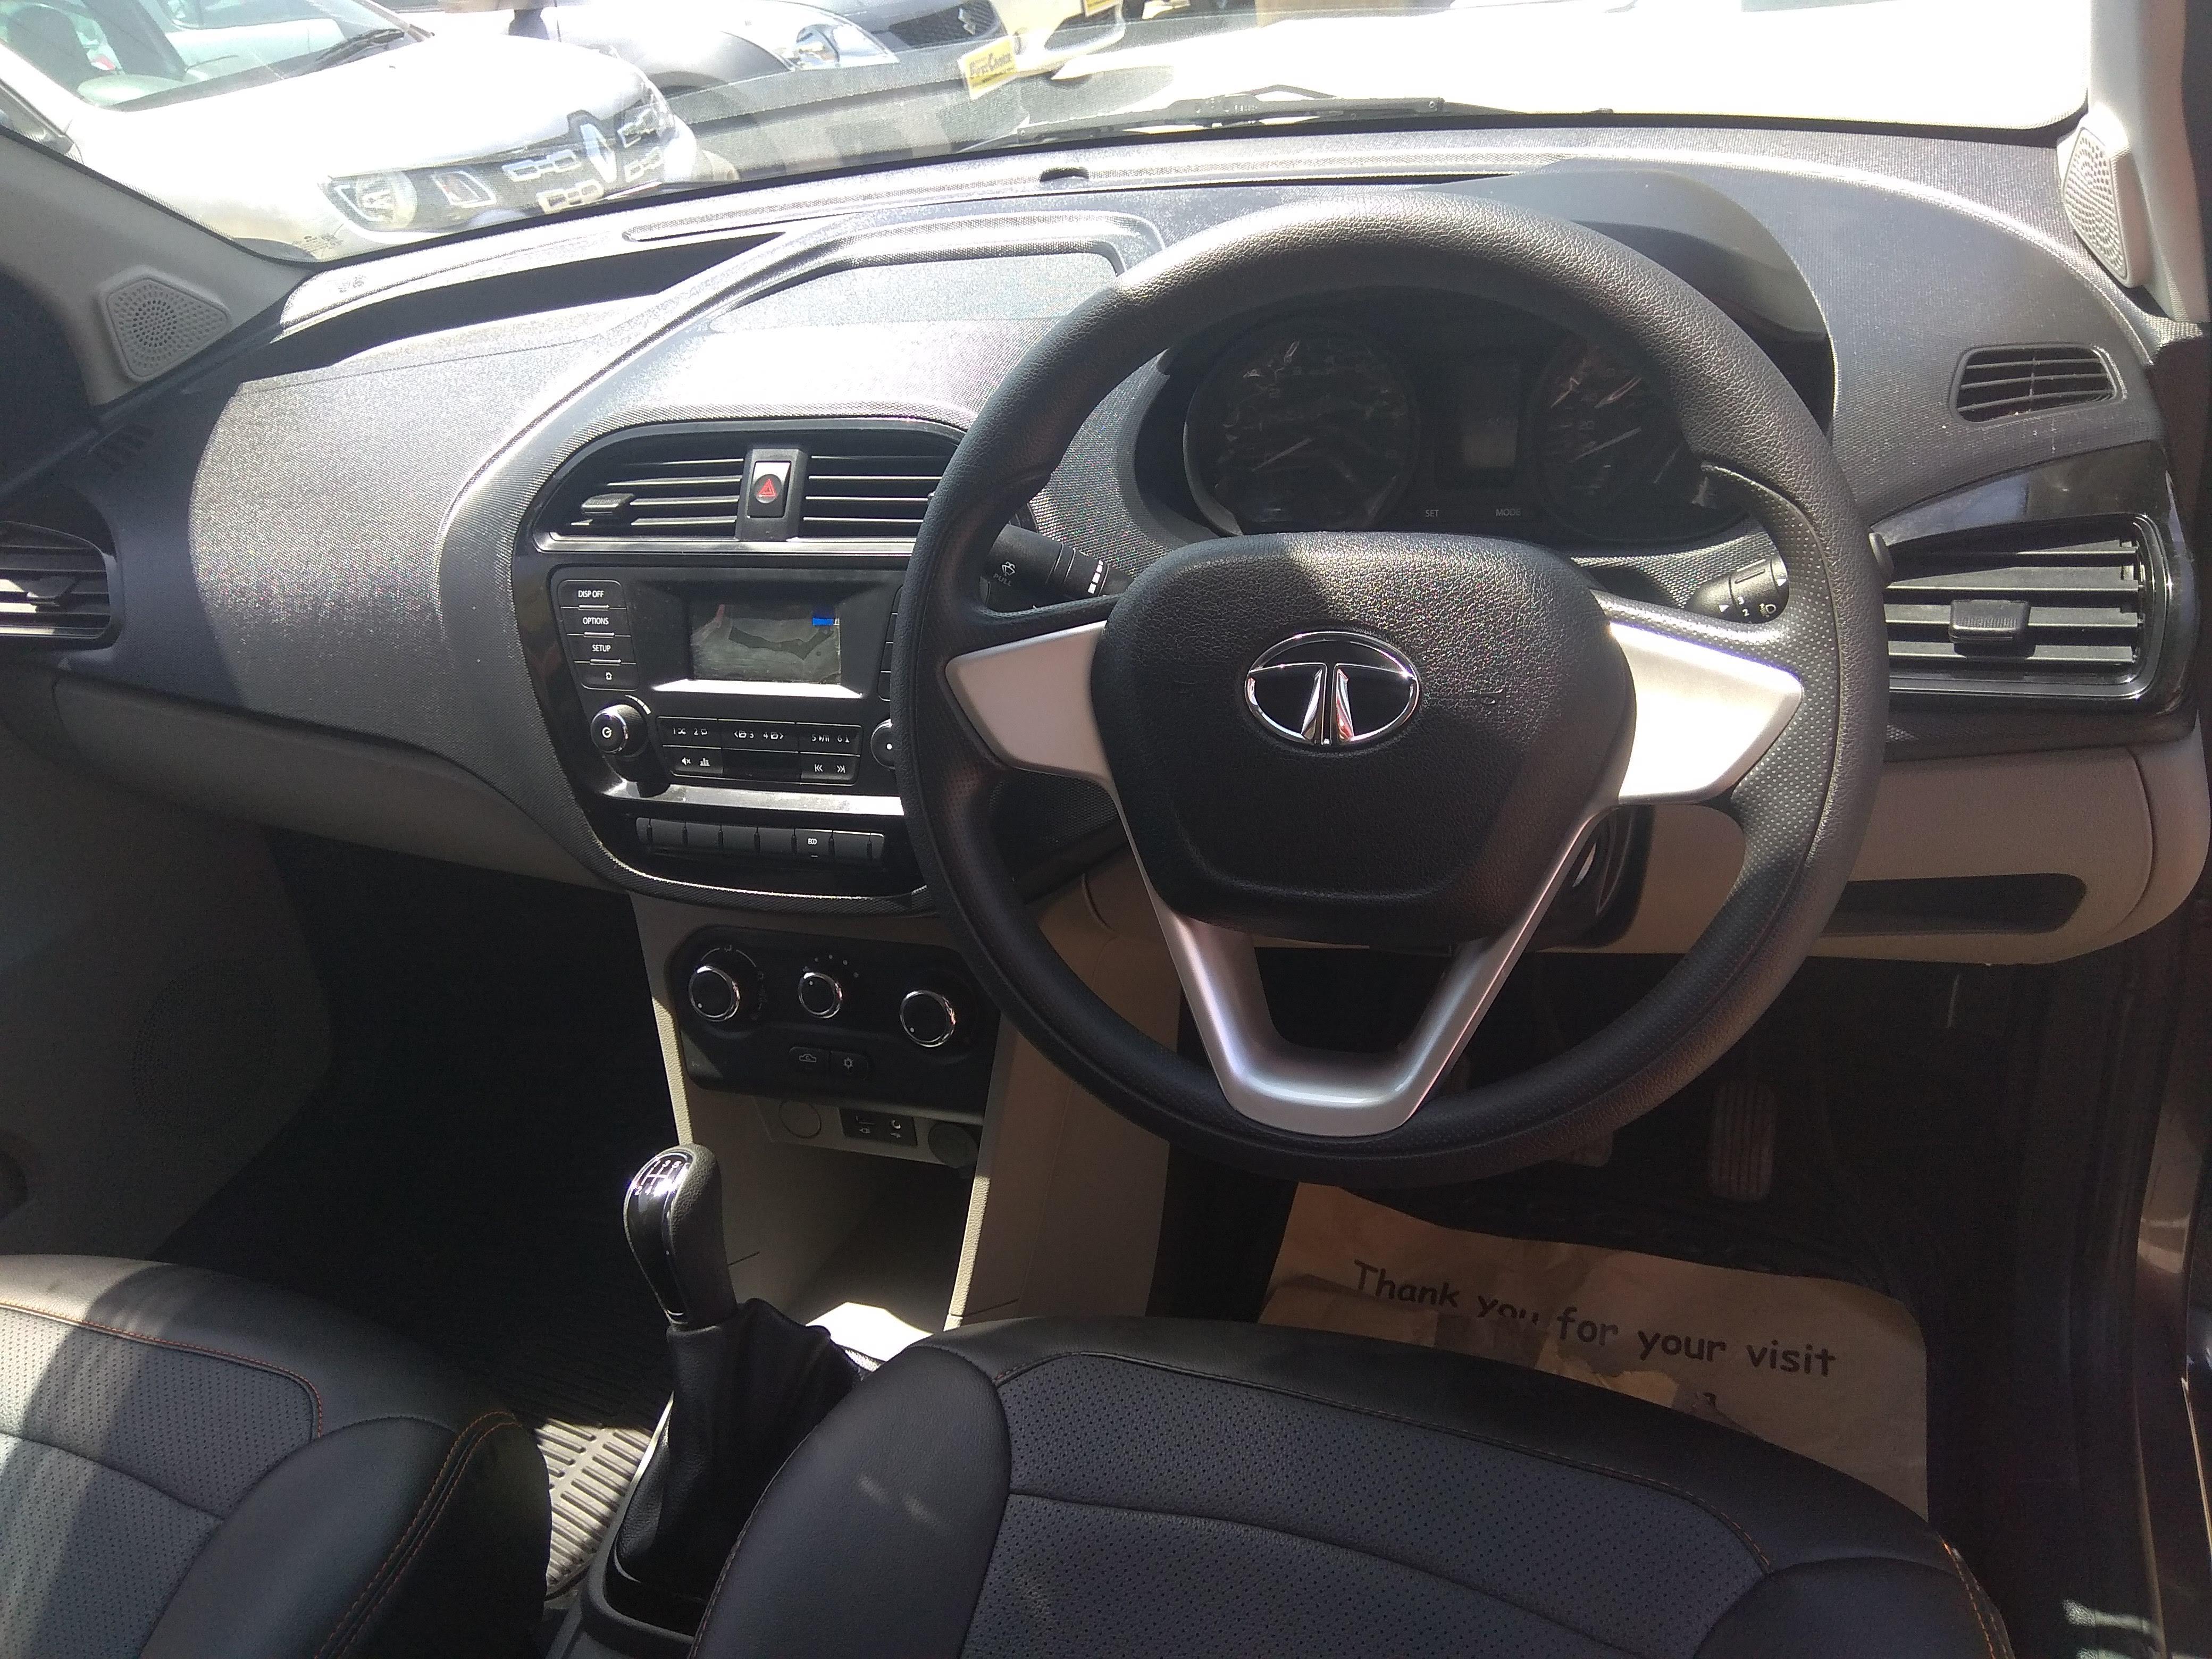 Tata Tiago Xt - Mahindra First Choice